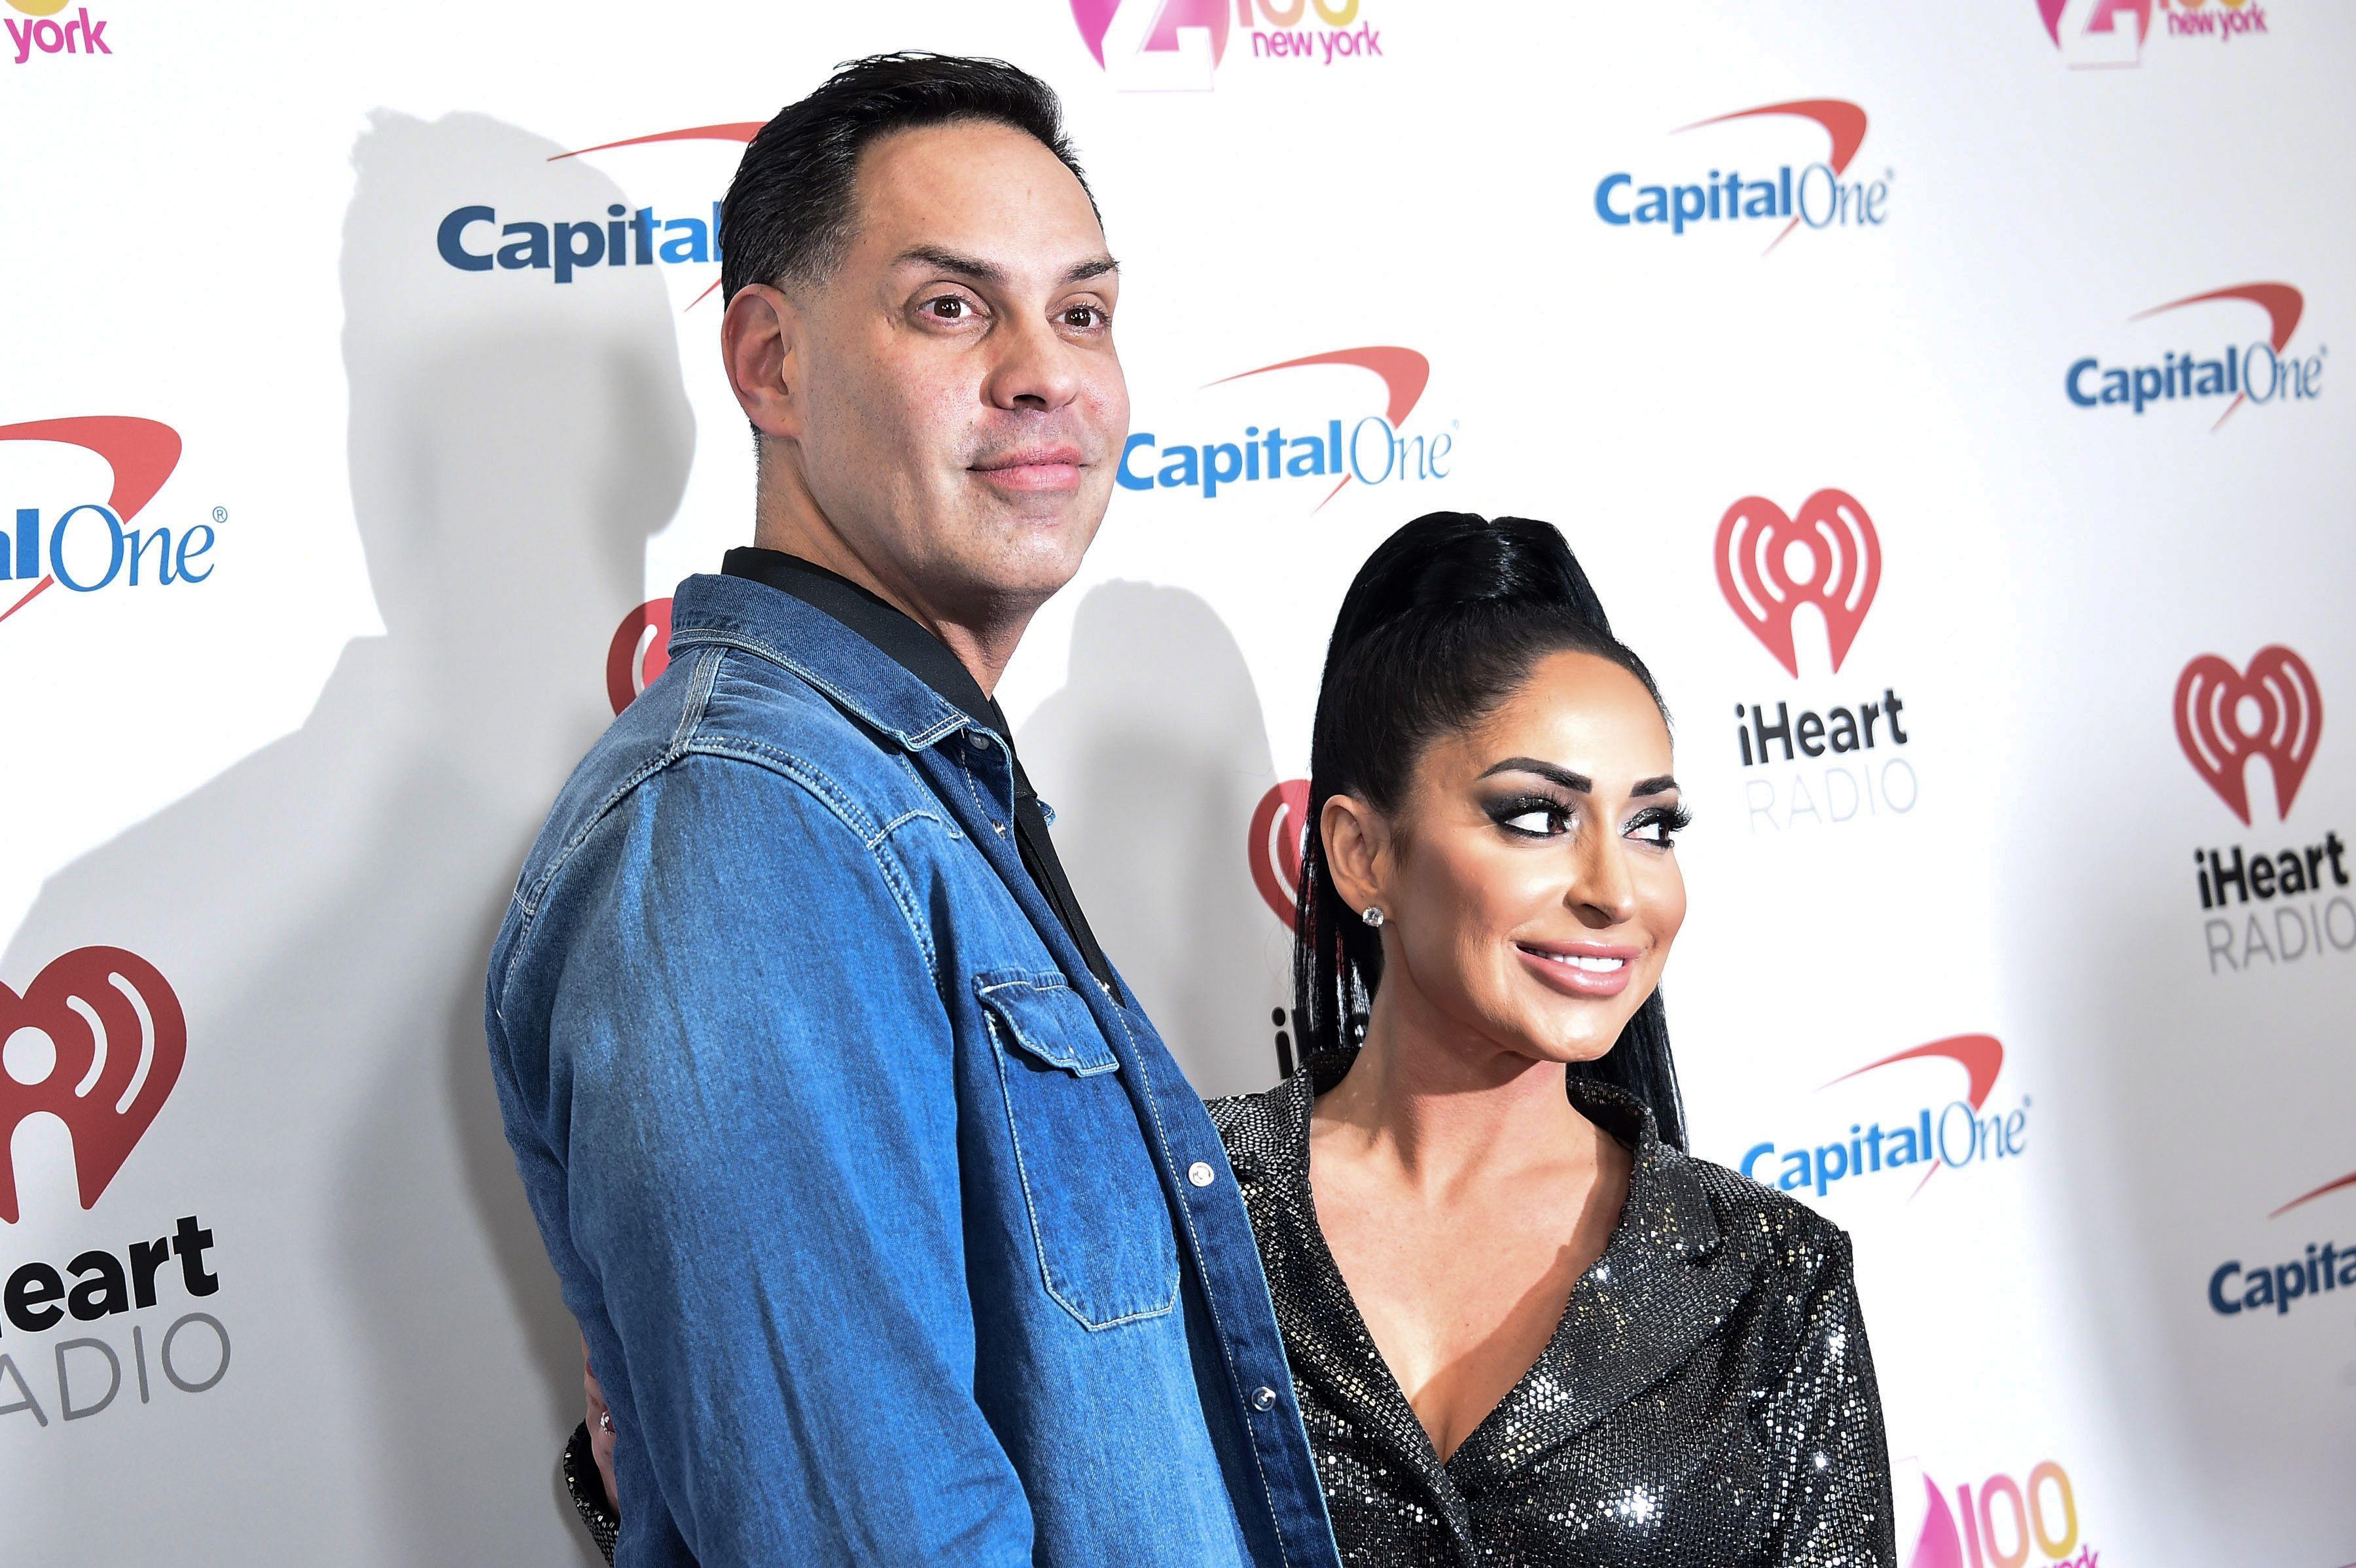 Jersey Shore': Did Angelina Pivarnick and Chris Larangeira Break Up?